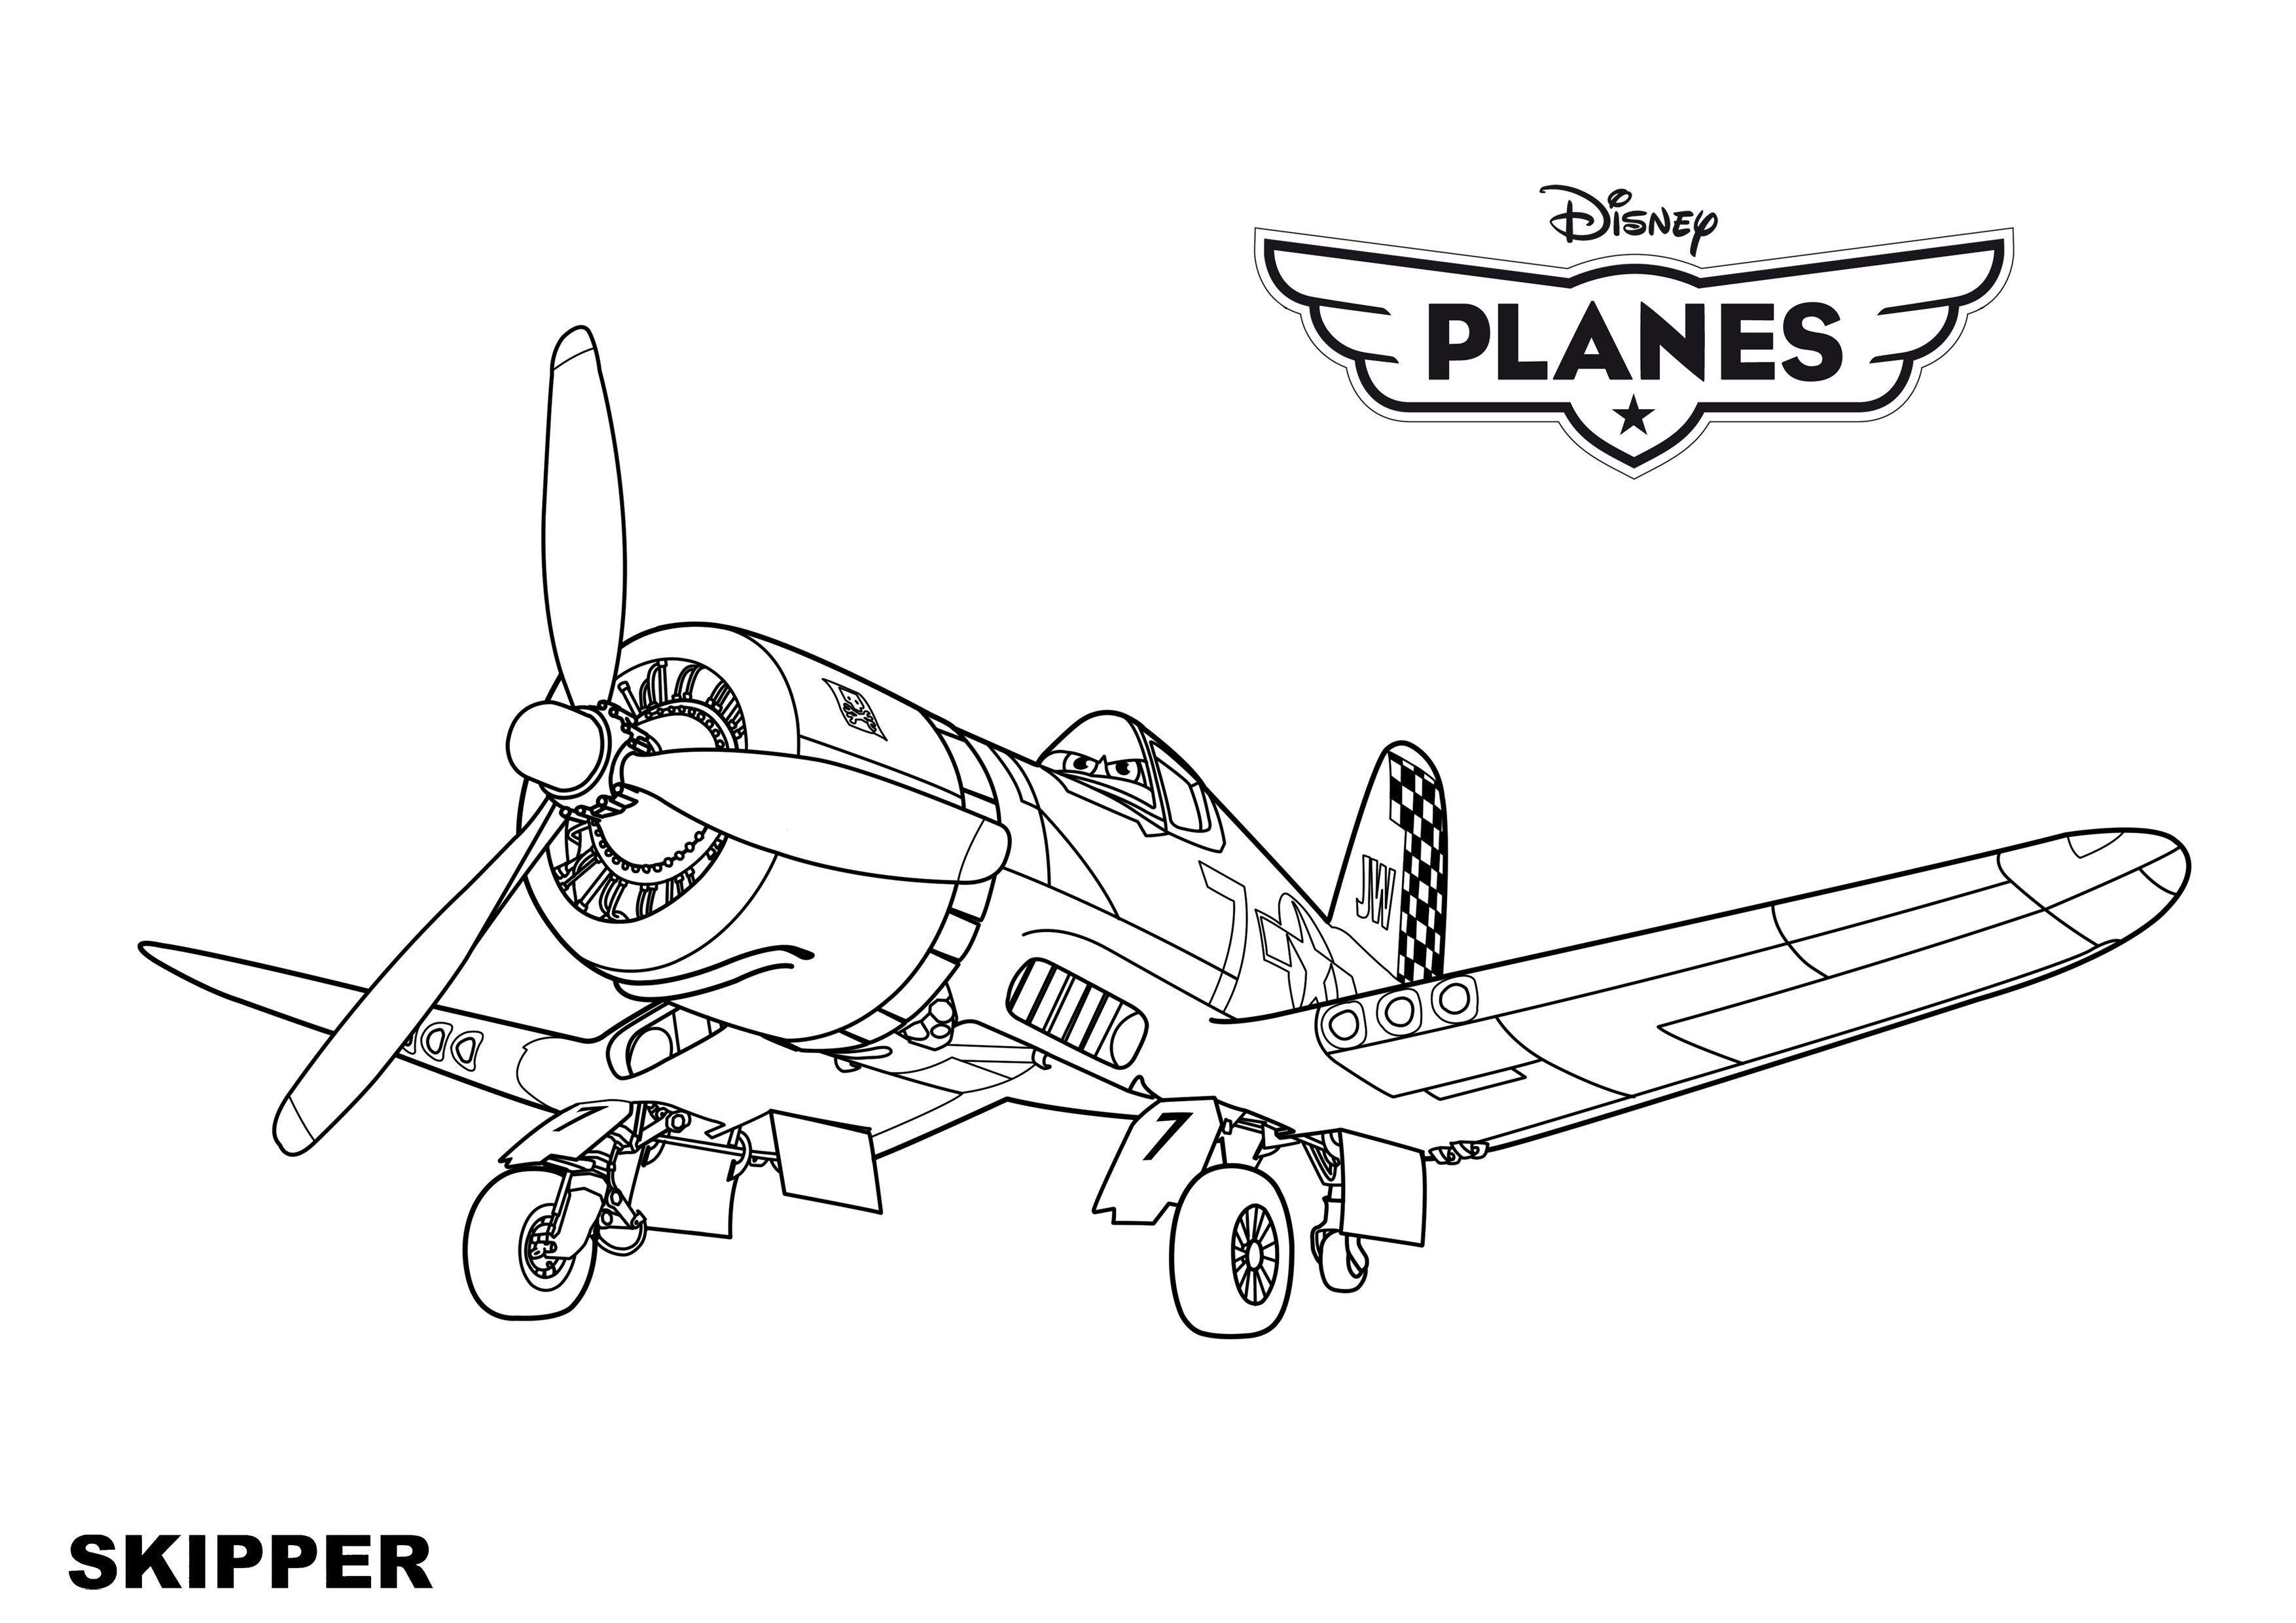 10 Disney Planes Characters Disney Planes Dusty Crophopper